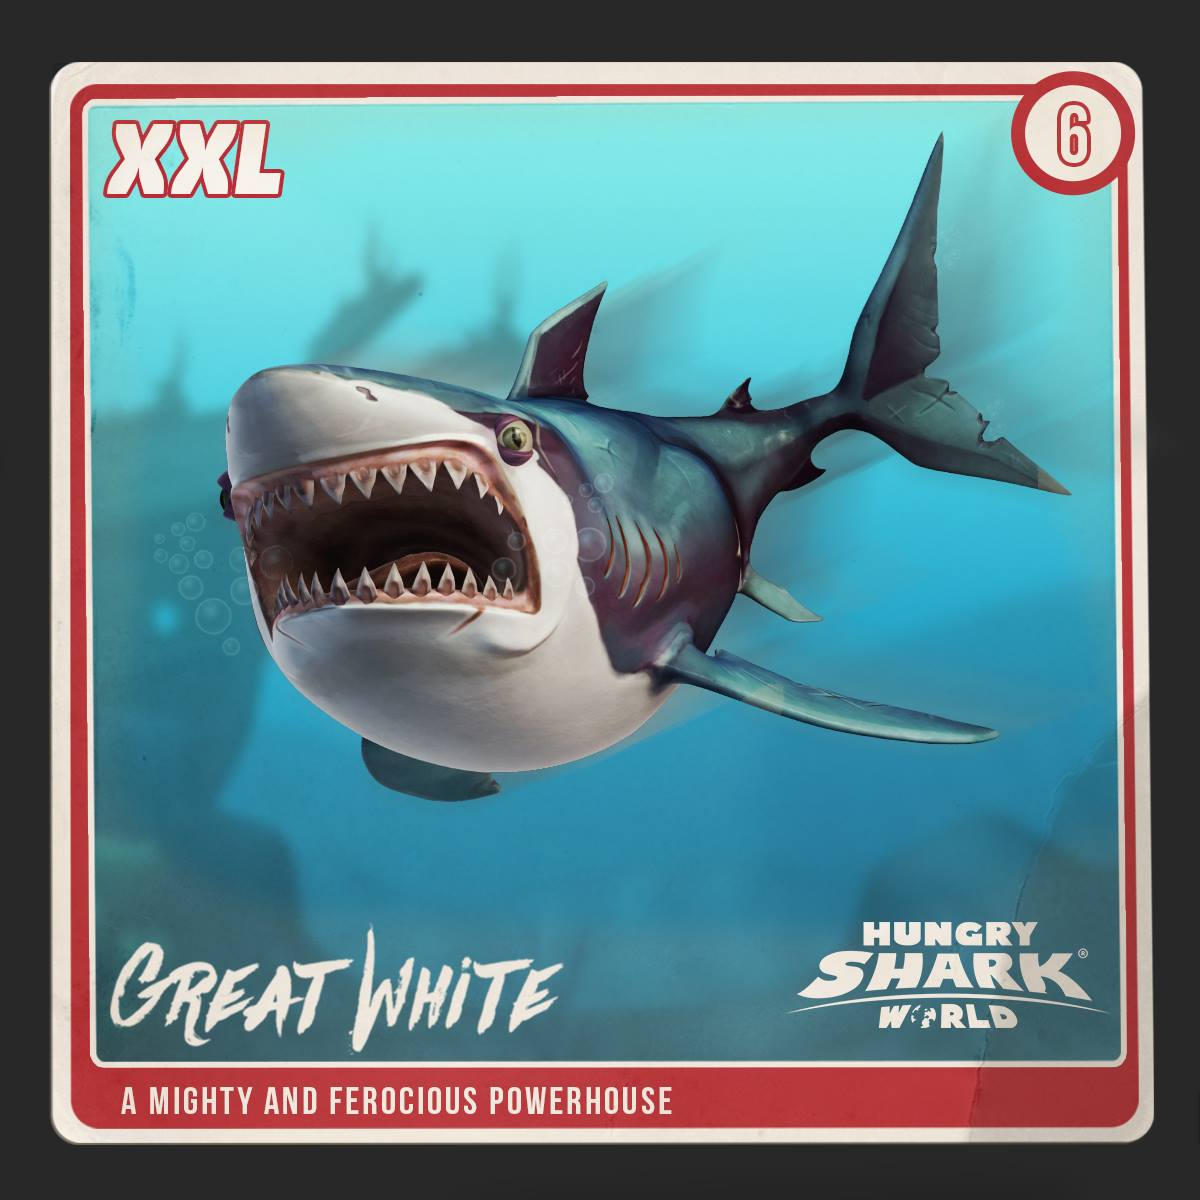 Great White Shark Enemies | Great White Shark World Hungry Shark Wiki Fandom Powered By Wikia